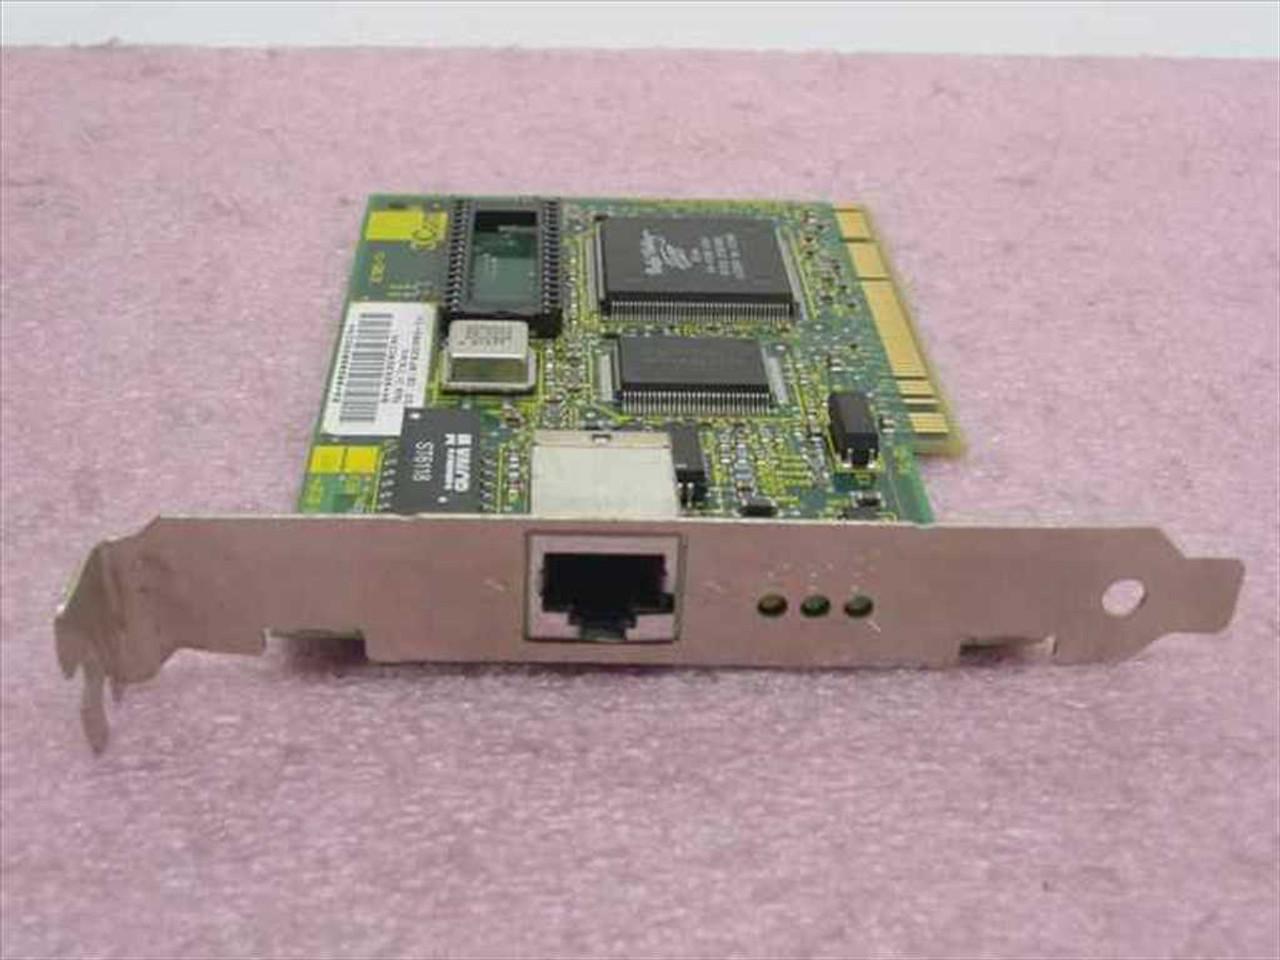 3COM FAST ETHERLINK XL PCI 3C905-TX DRIVER FOR WINDOWS 8